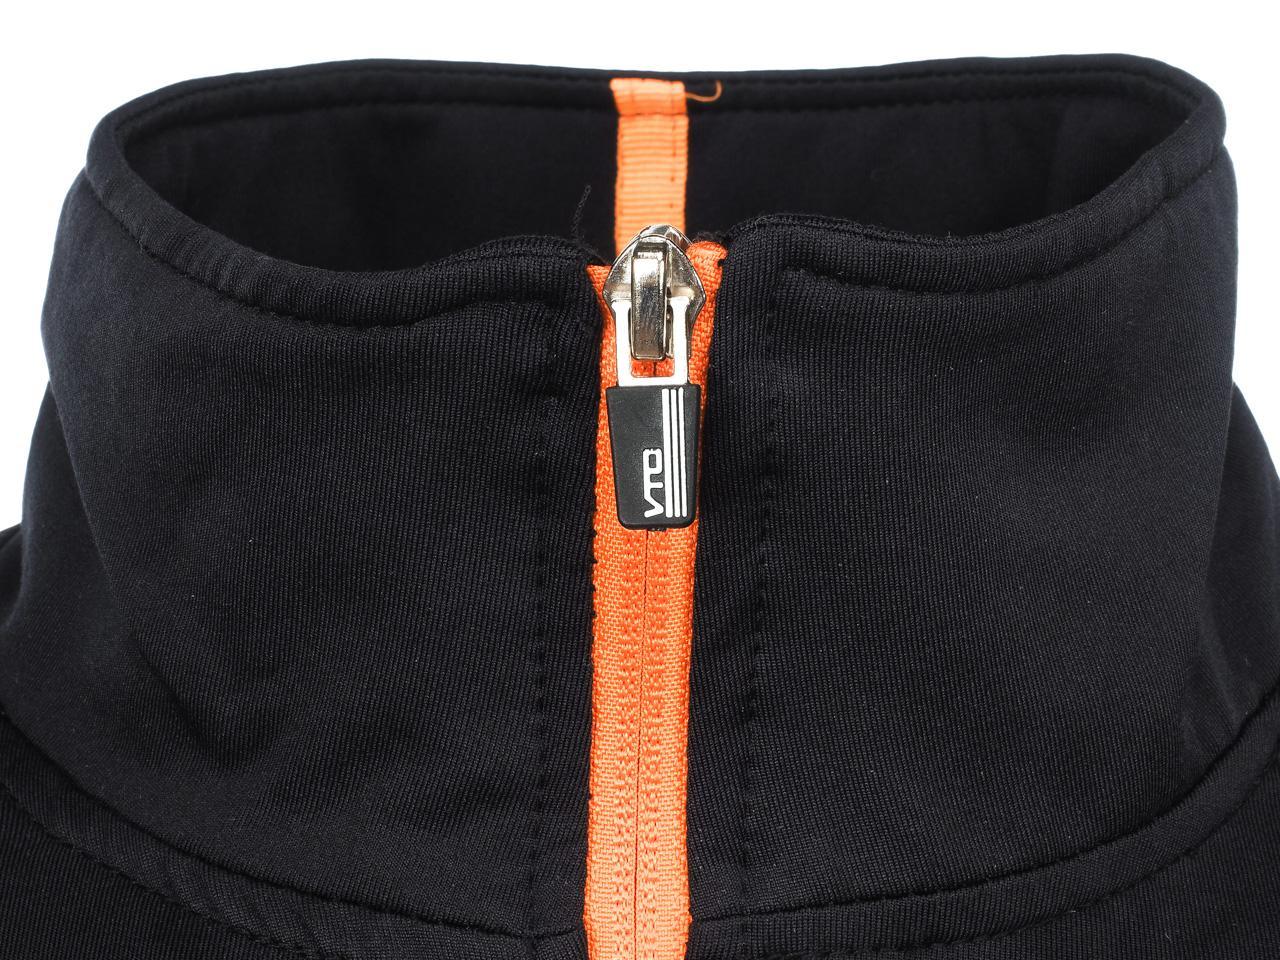 Under-Clothing-Thermal-Hot-Alpes-Vertigo-Manu-Blk-1-2z-ML-Tee-Poly-Black-251 thumbnail 3